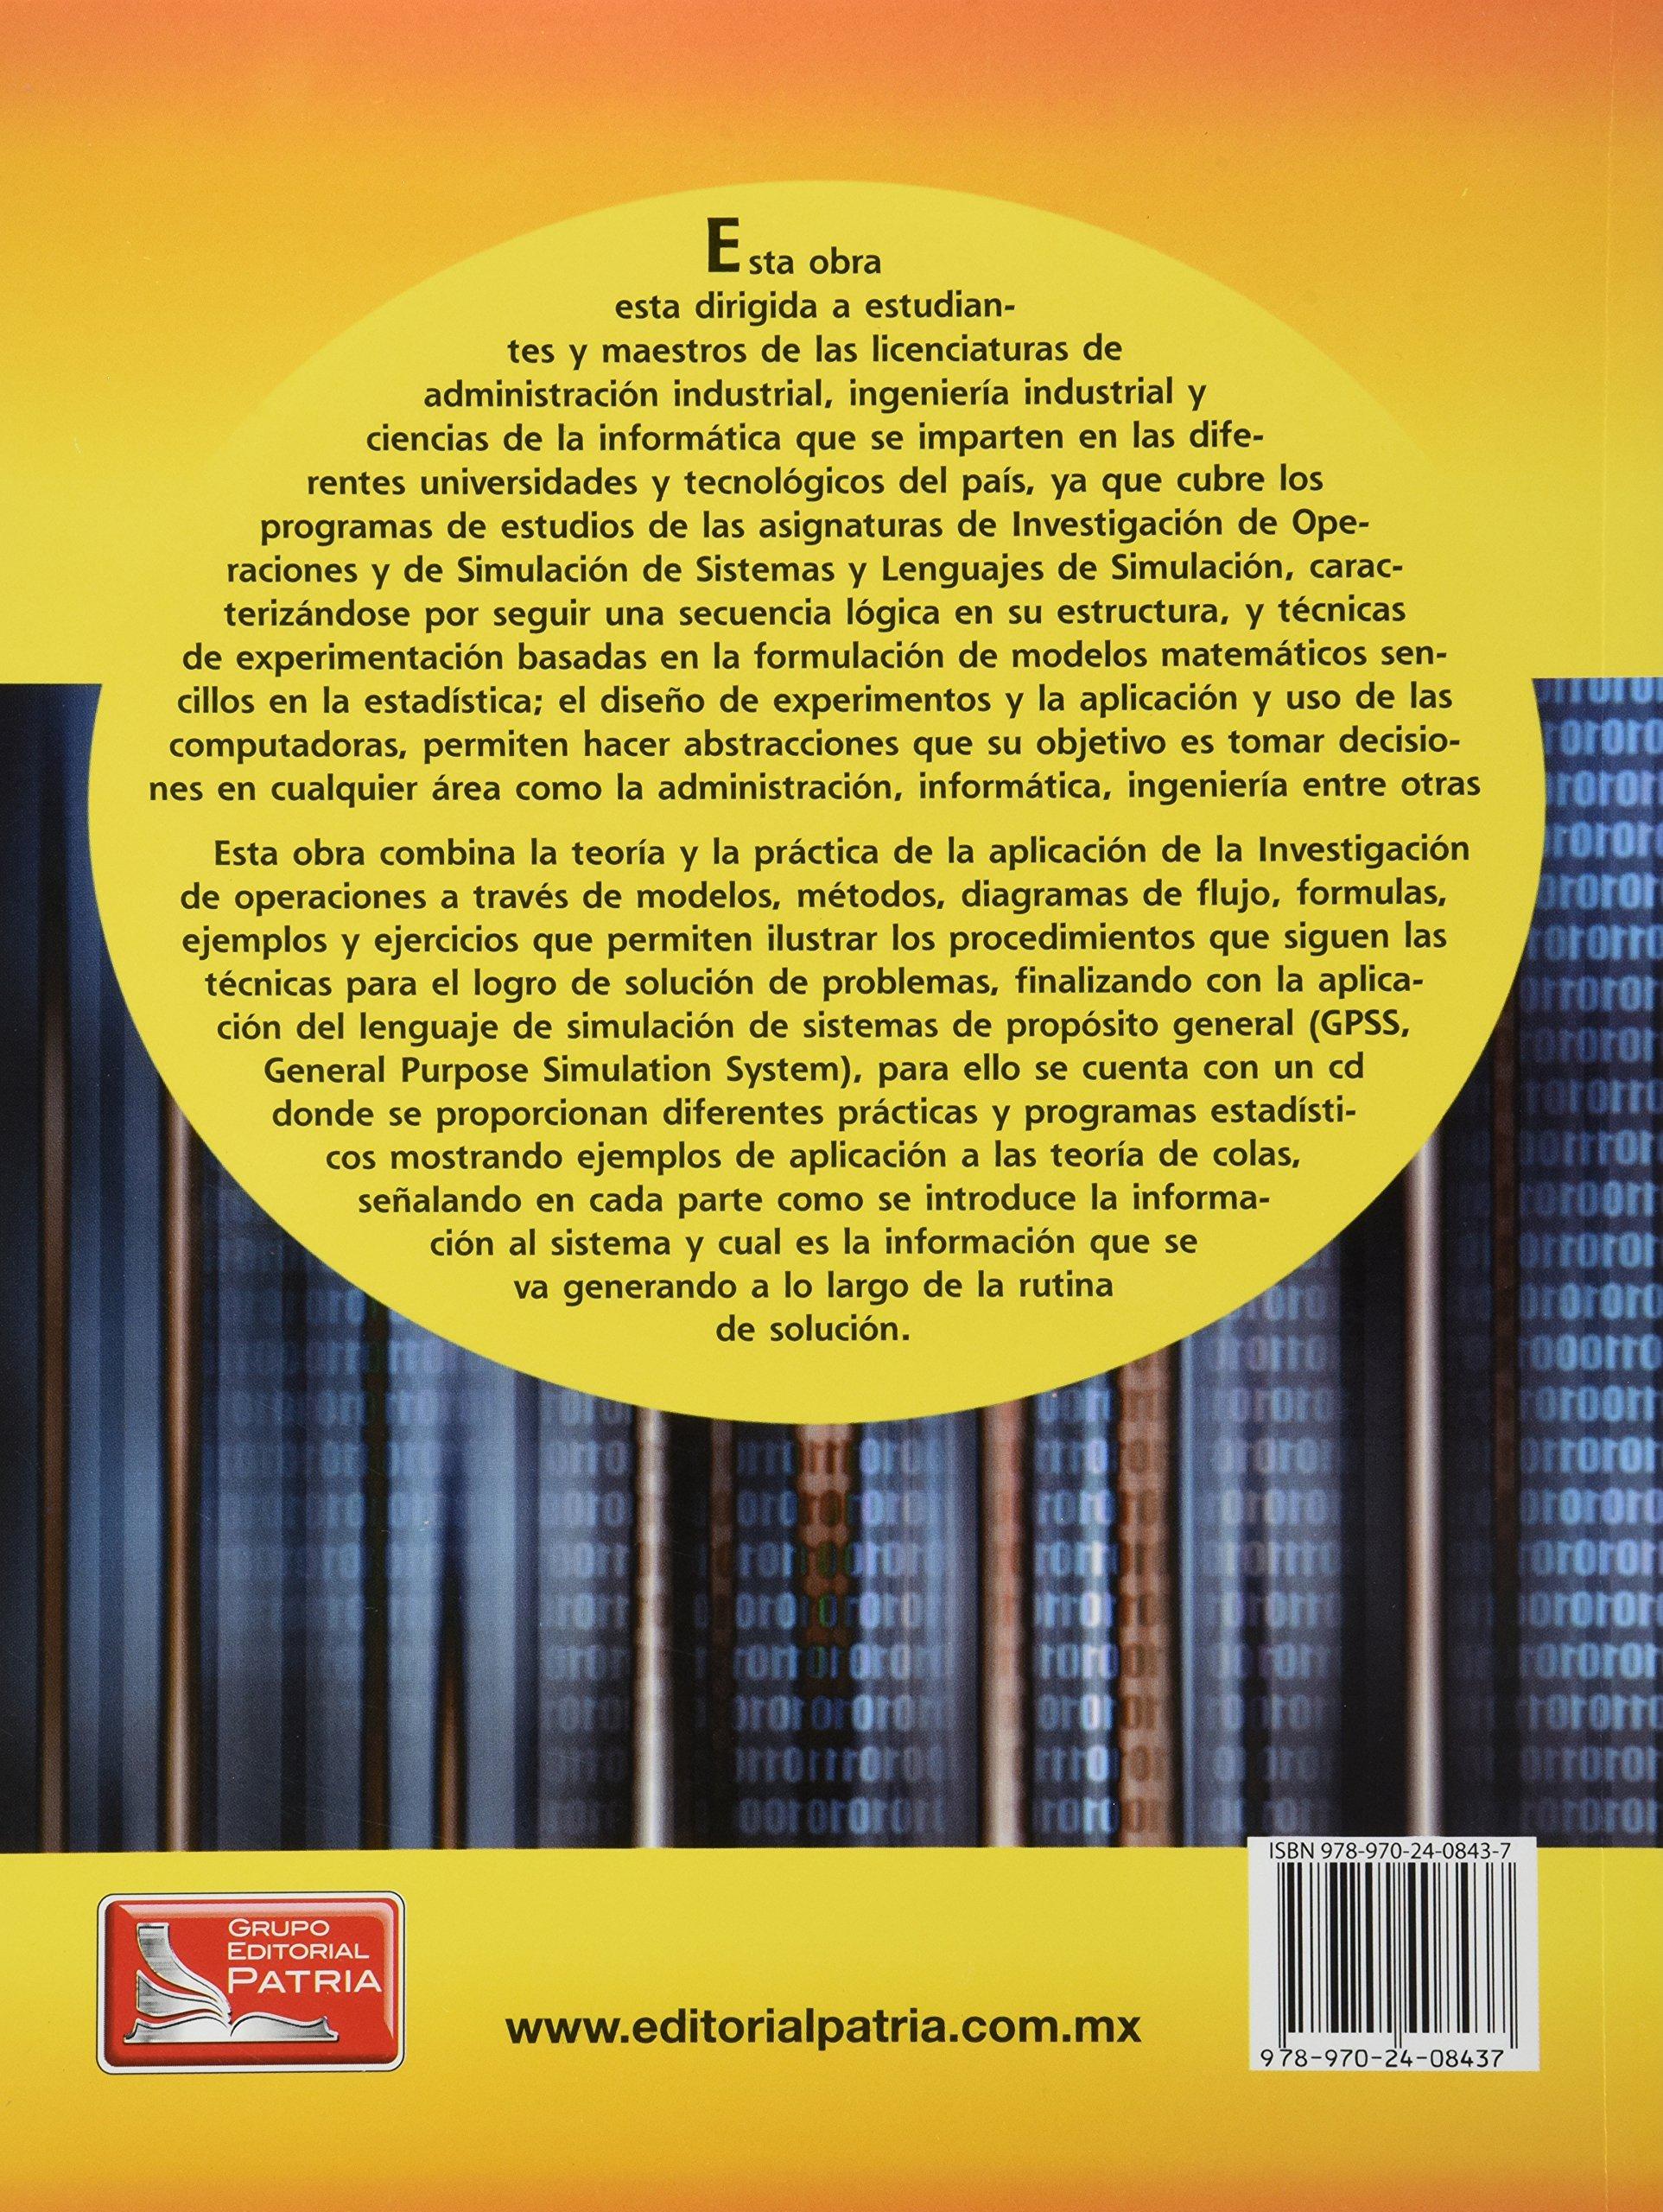 Simulacion de sistemas para administracion e ingenieria c cd francisco garcia mora amazon com mx libros